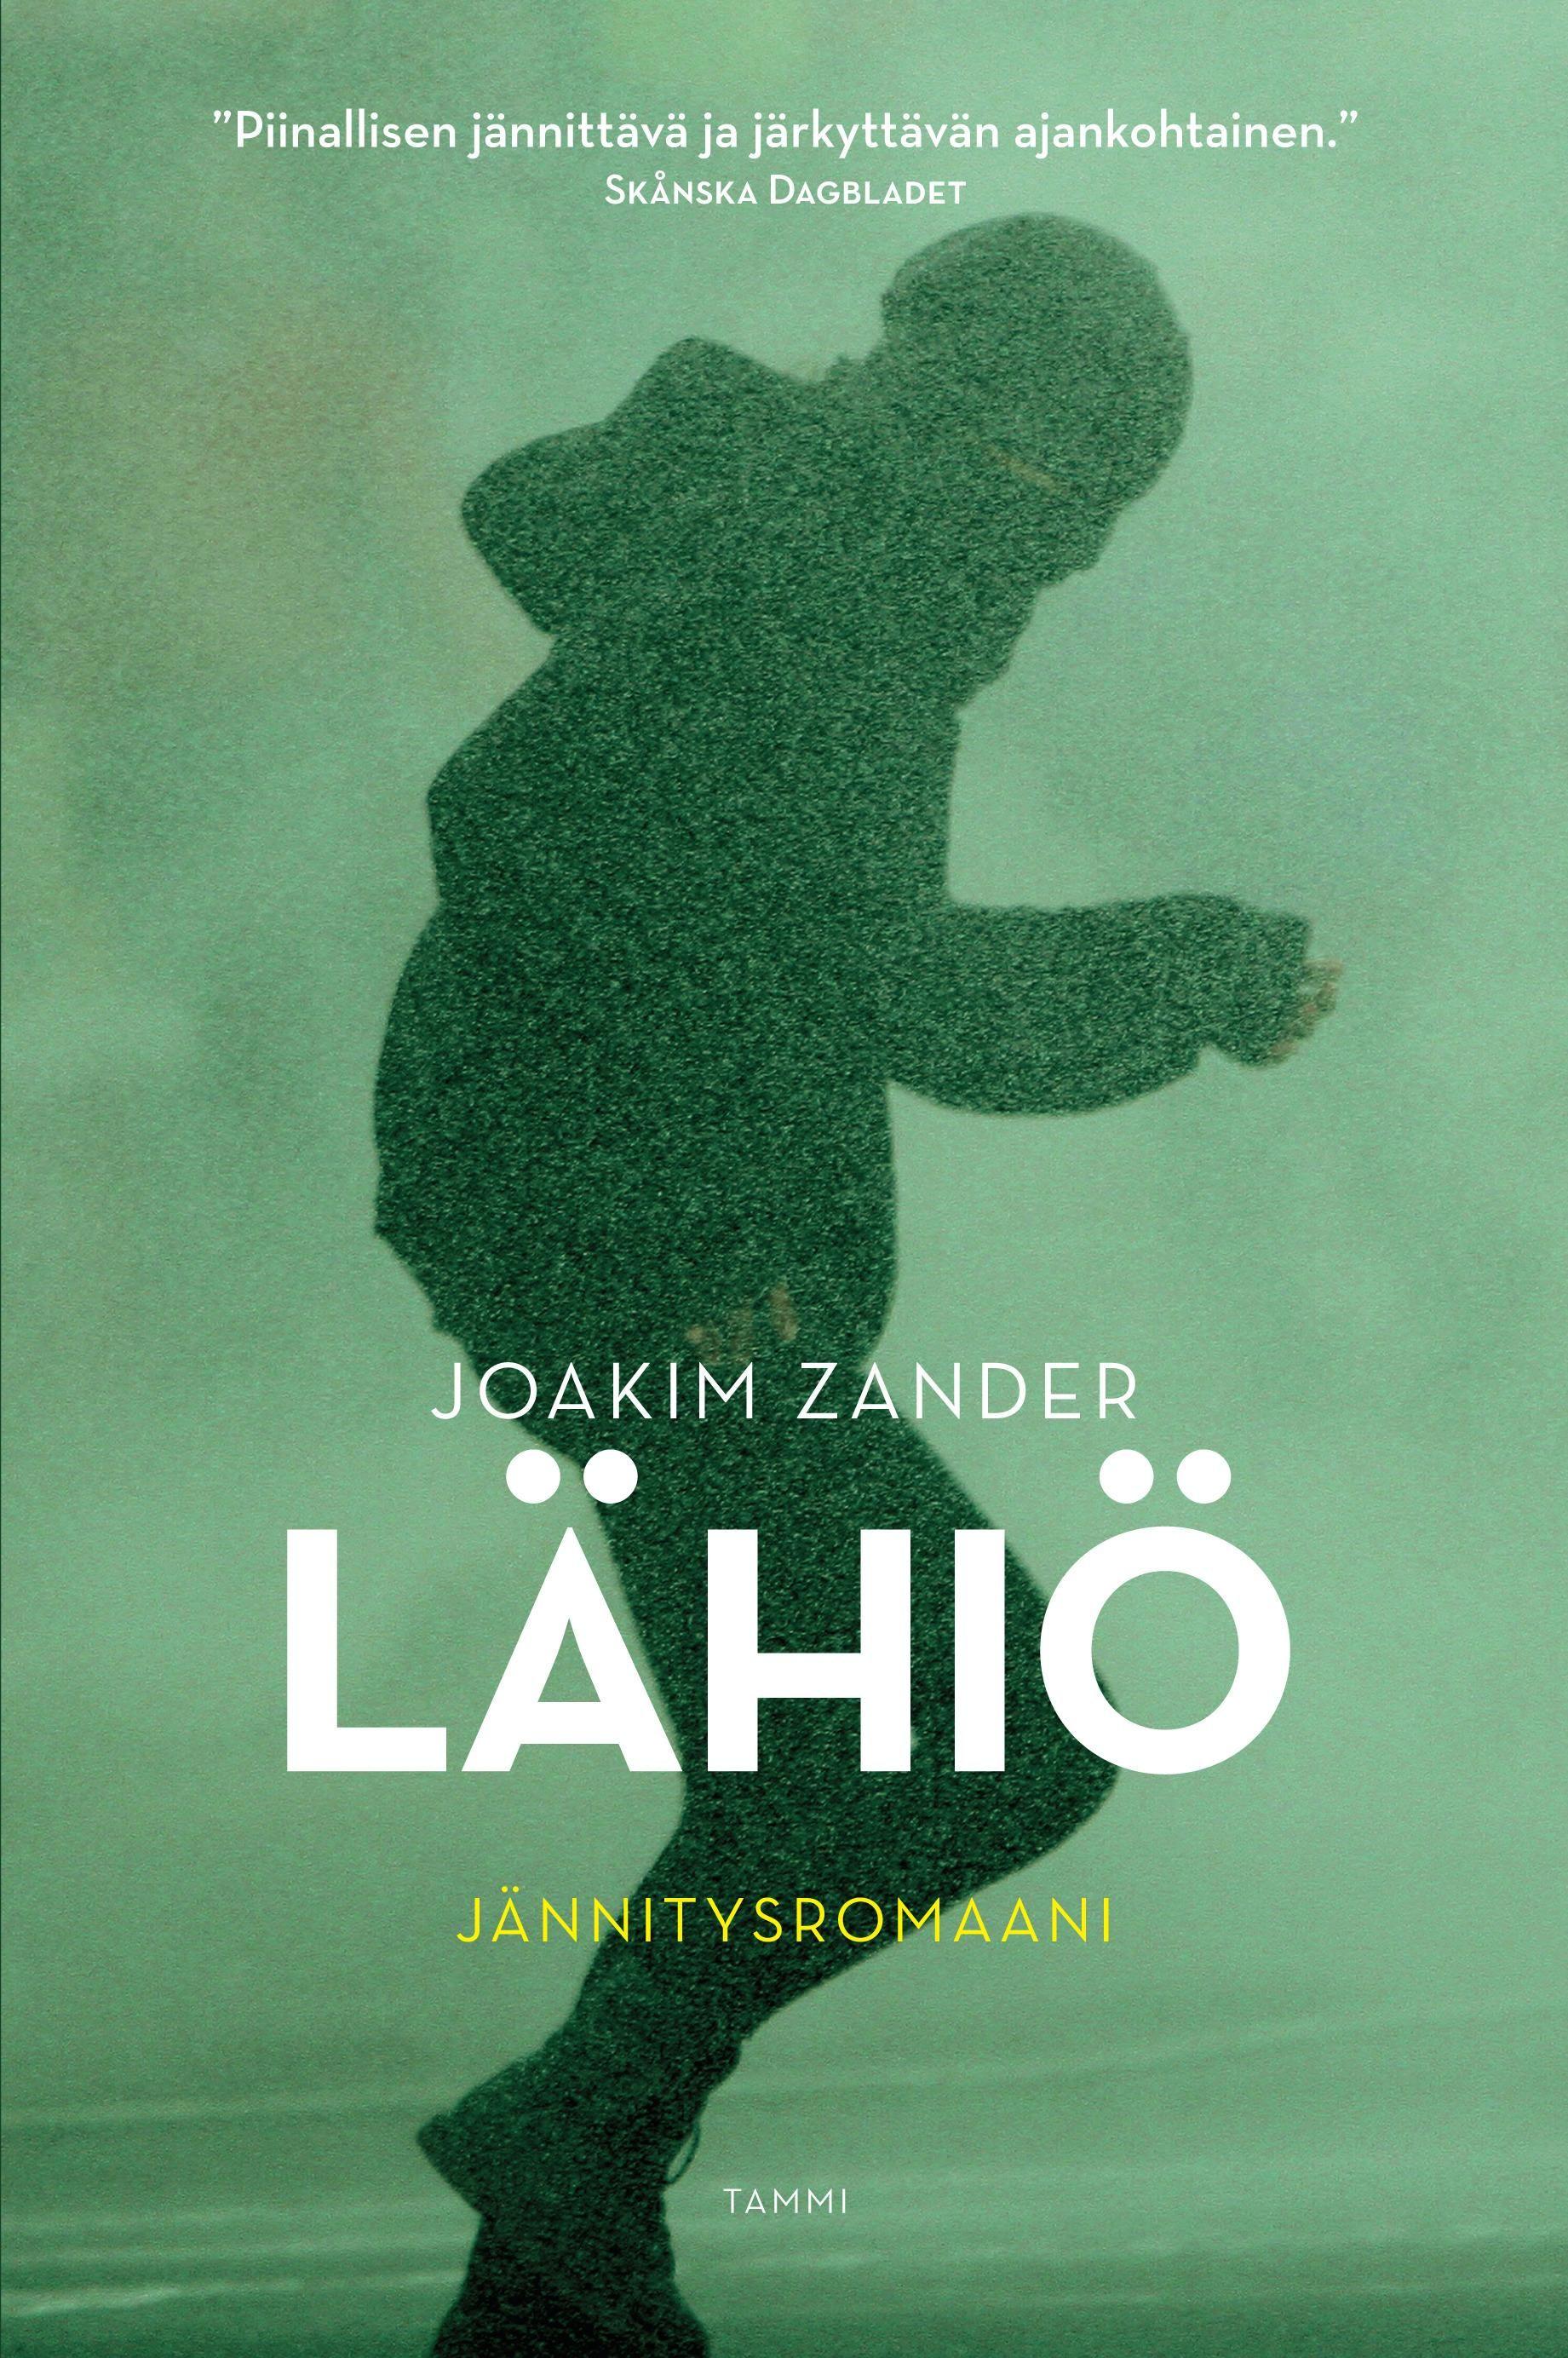 Lähiö - Joakim Zander - #kirja